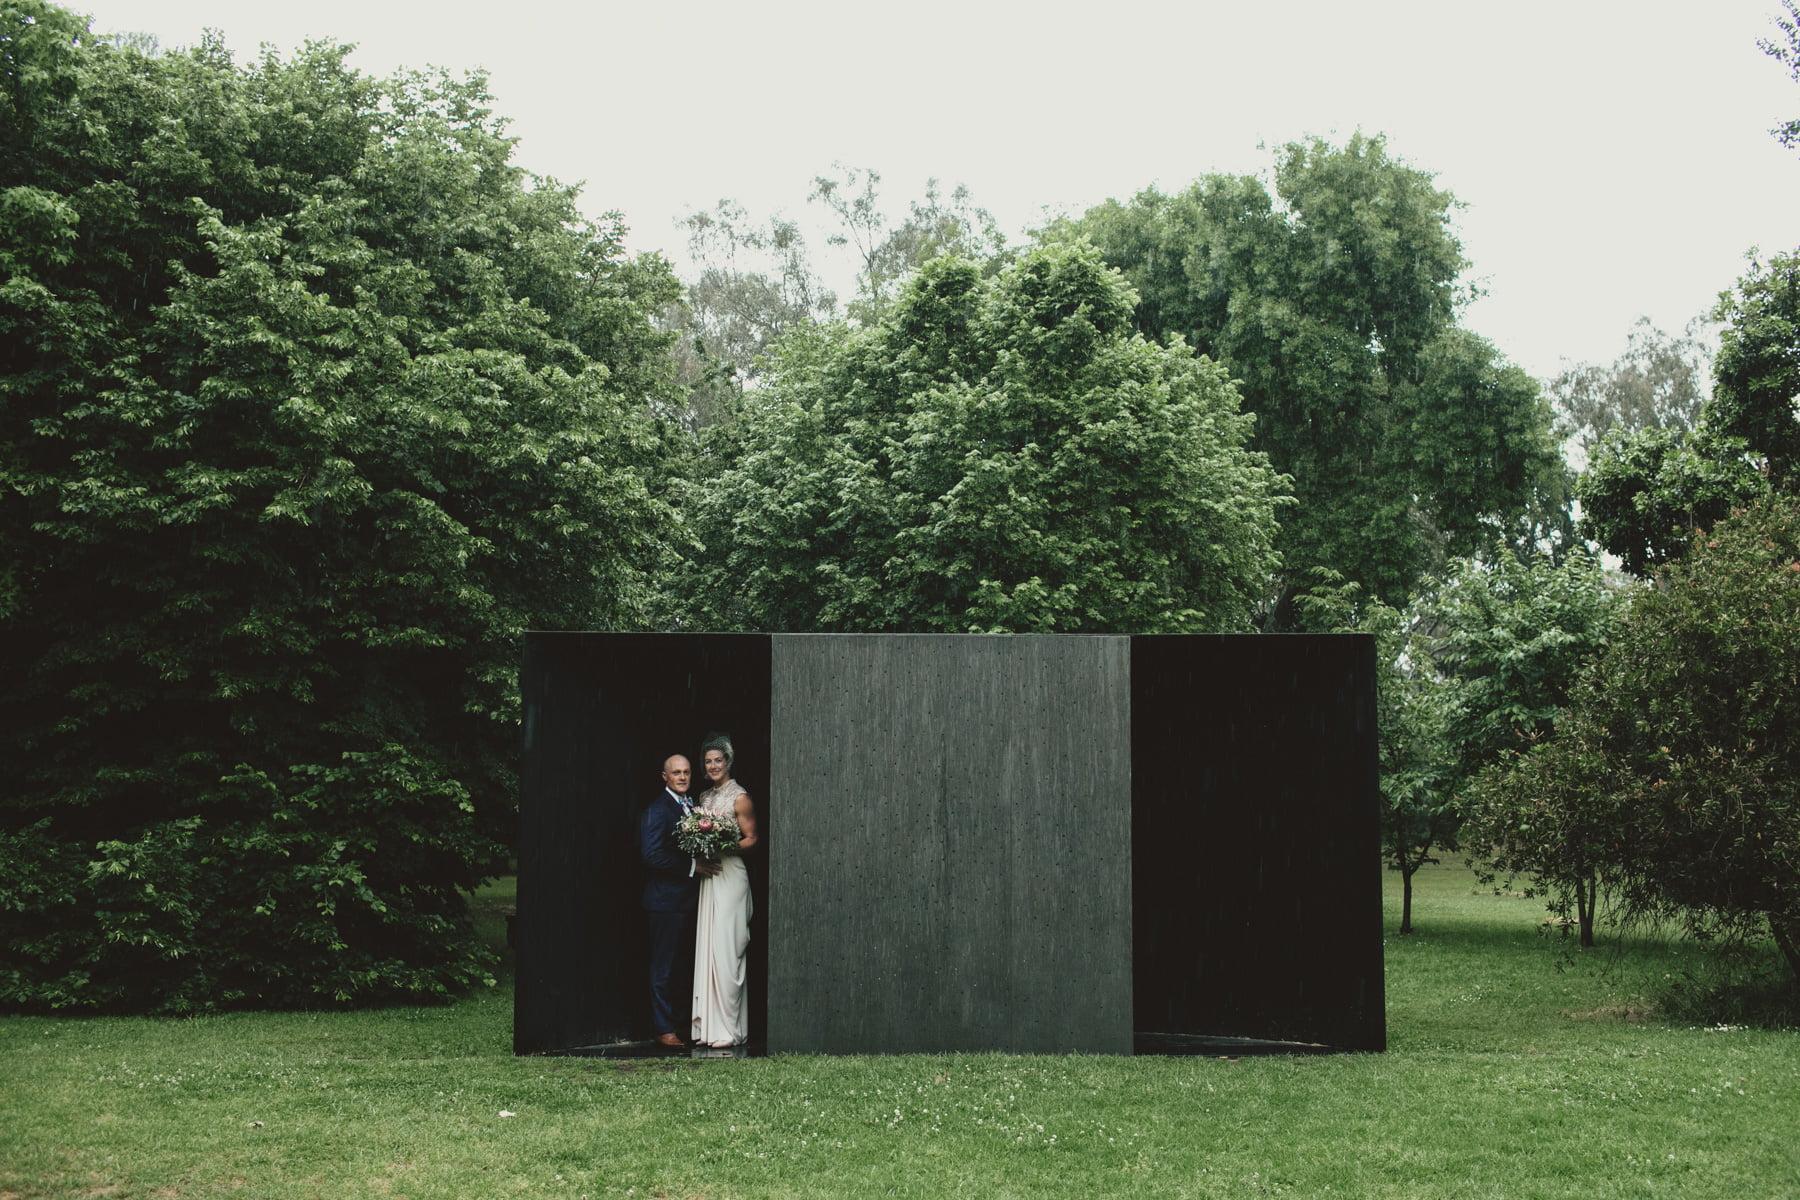 Sophie + Hamish // Heide Museum